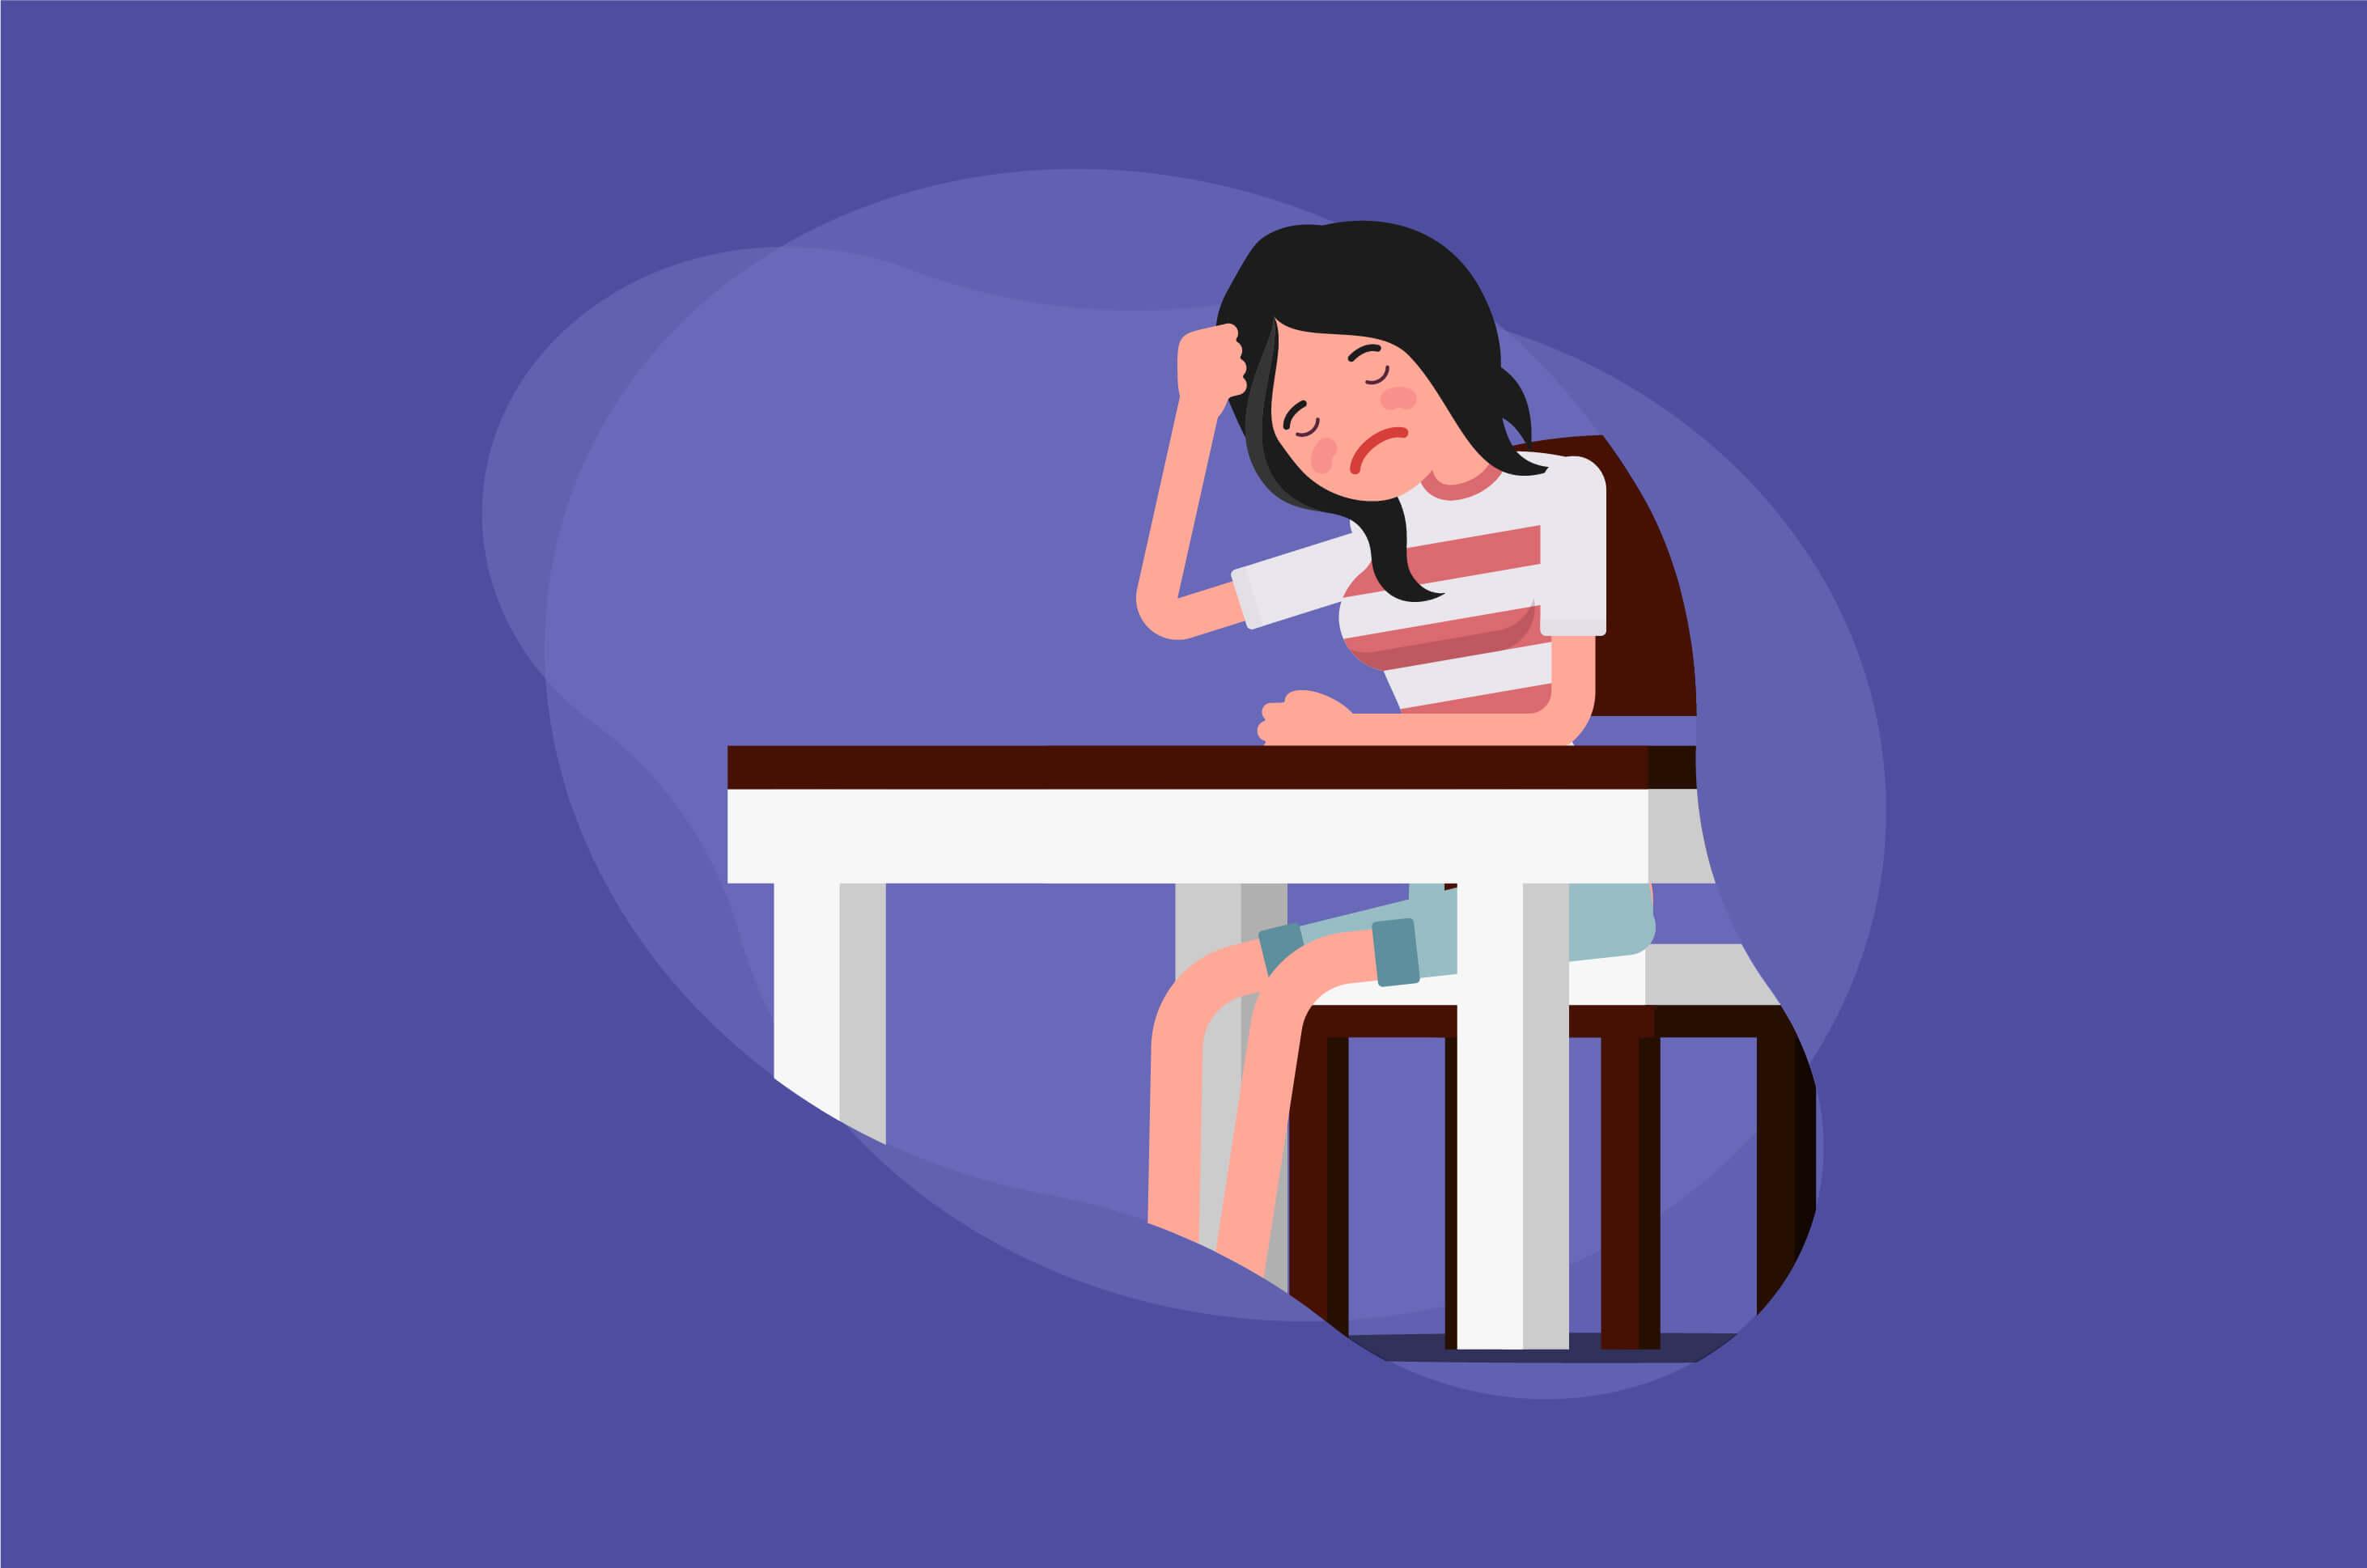 Jangan Diabaikan Sinusitis, karena Berisiko Idap Abses Otak